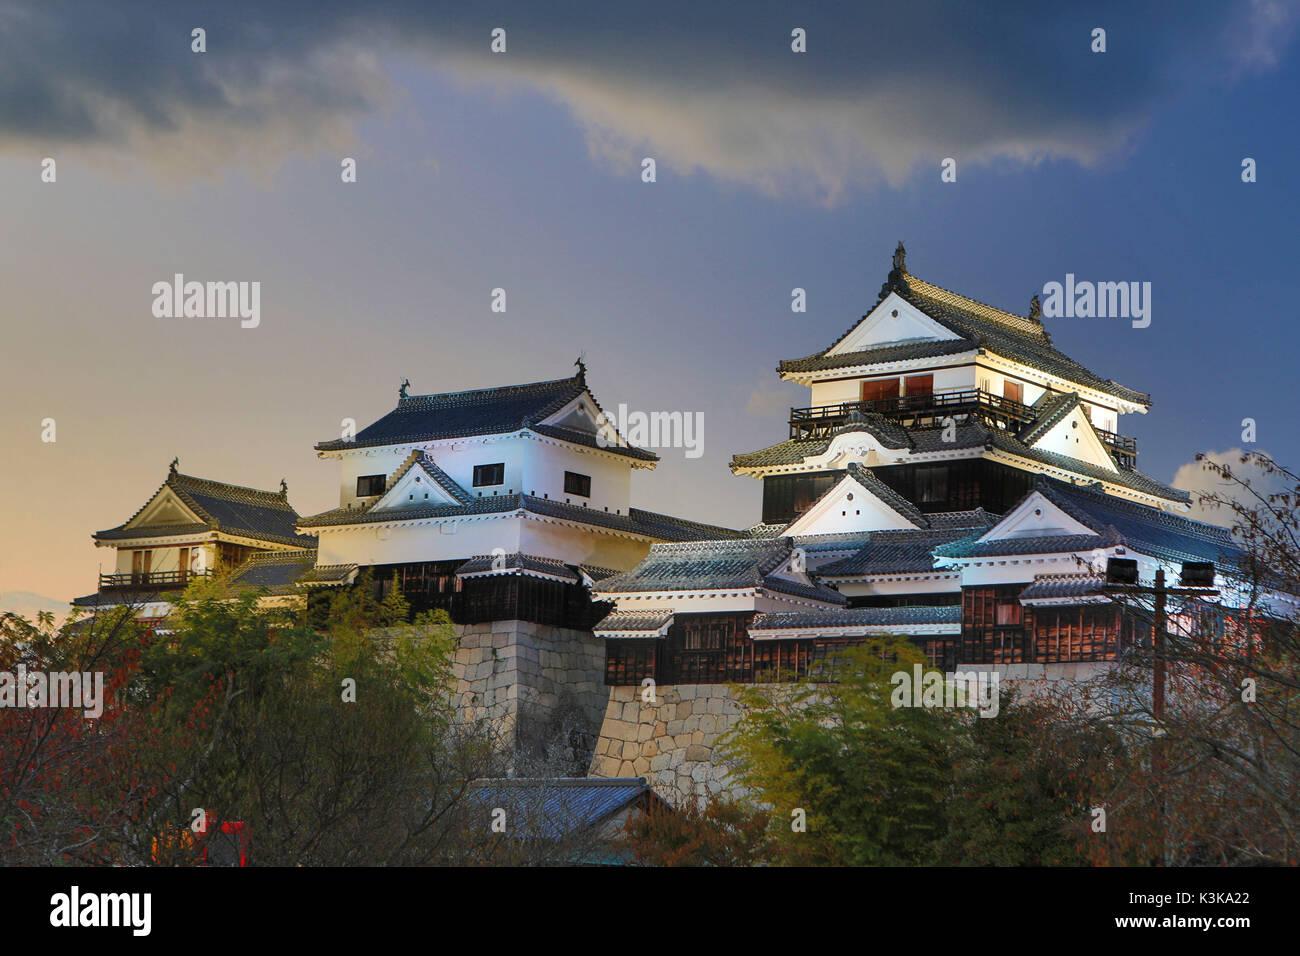 Le Japon, l'île de Shikoku, Matsuyama City, Matsuyama Castle Photo Stock